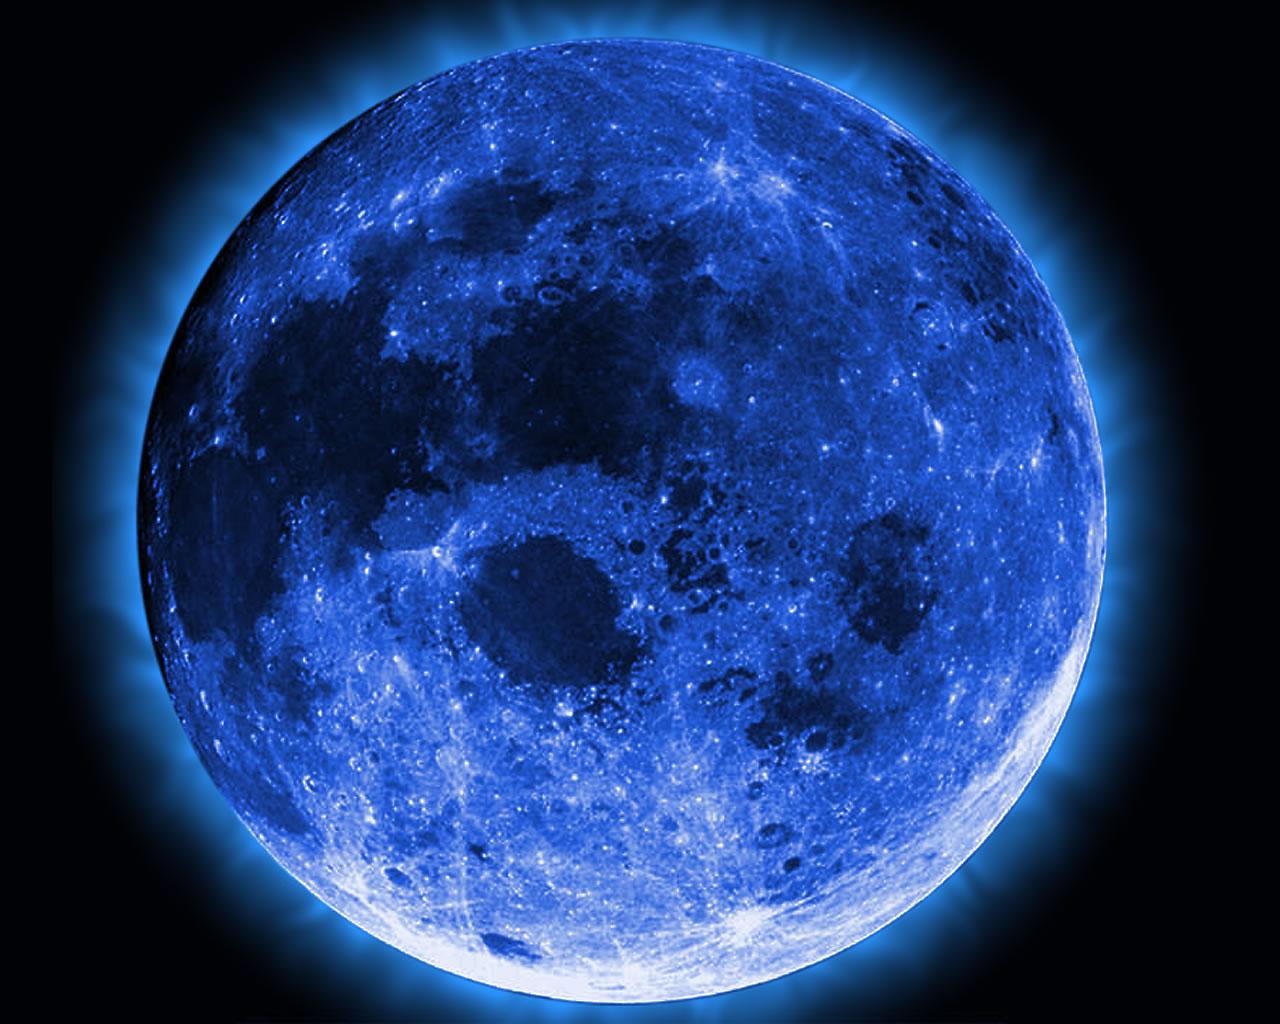 42 Blue Moon Wallpaper Hd On Wallpapersafari